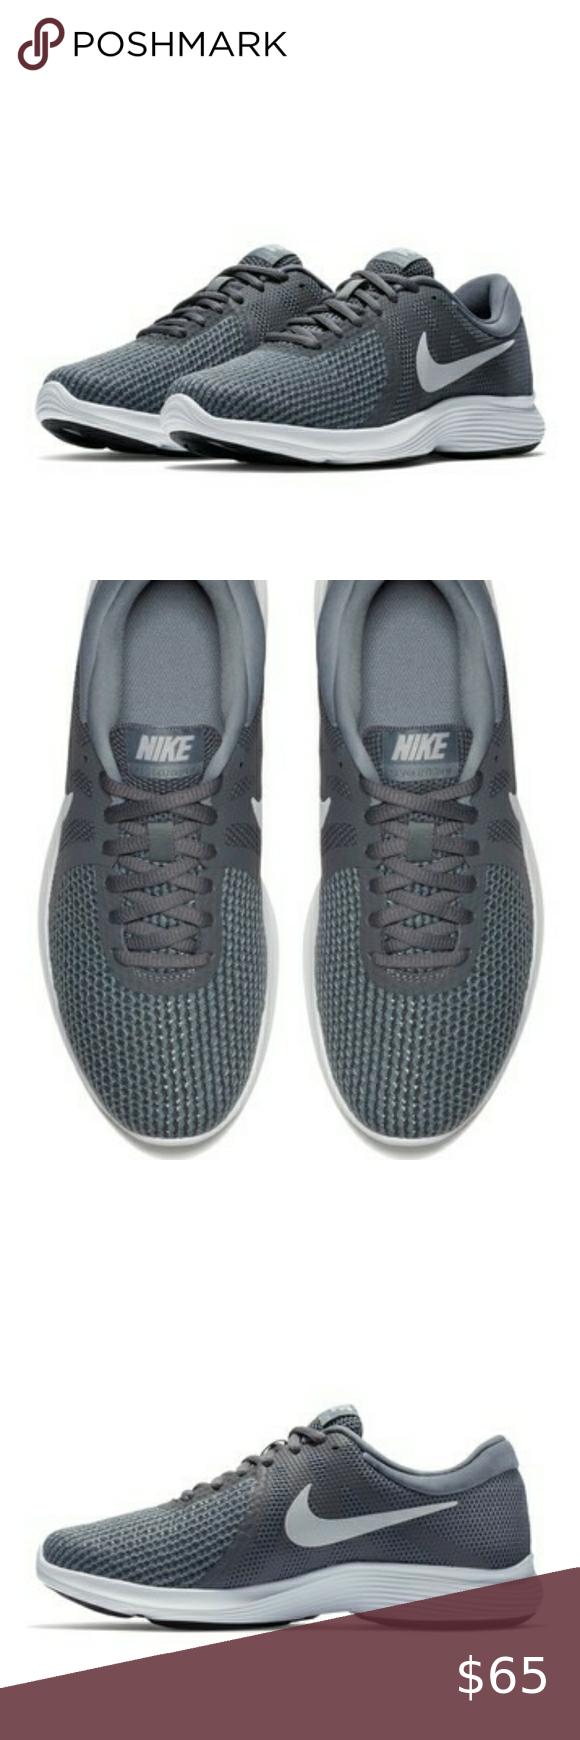 Nike Women S Running Sneakers Size 11 5 Wide New Running Sneakers Women Retro Nike Shoes Running Women